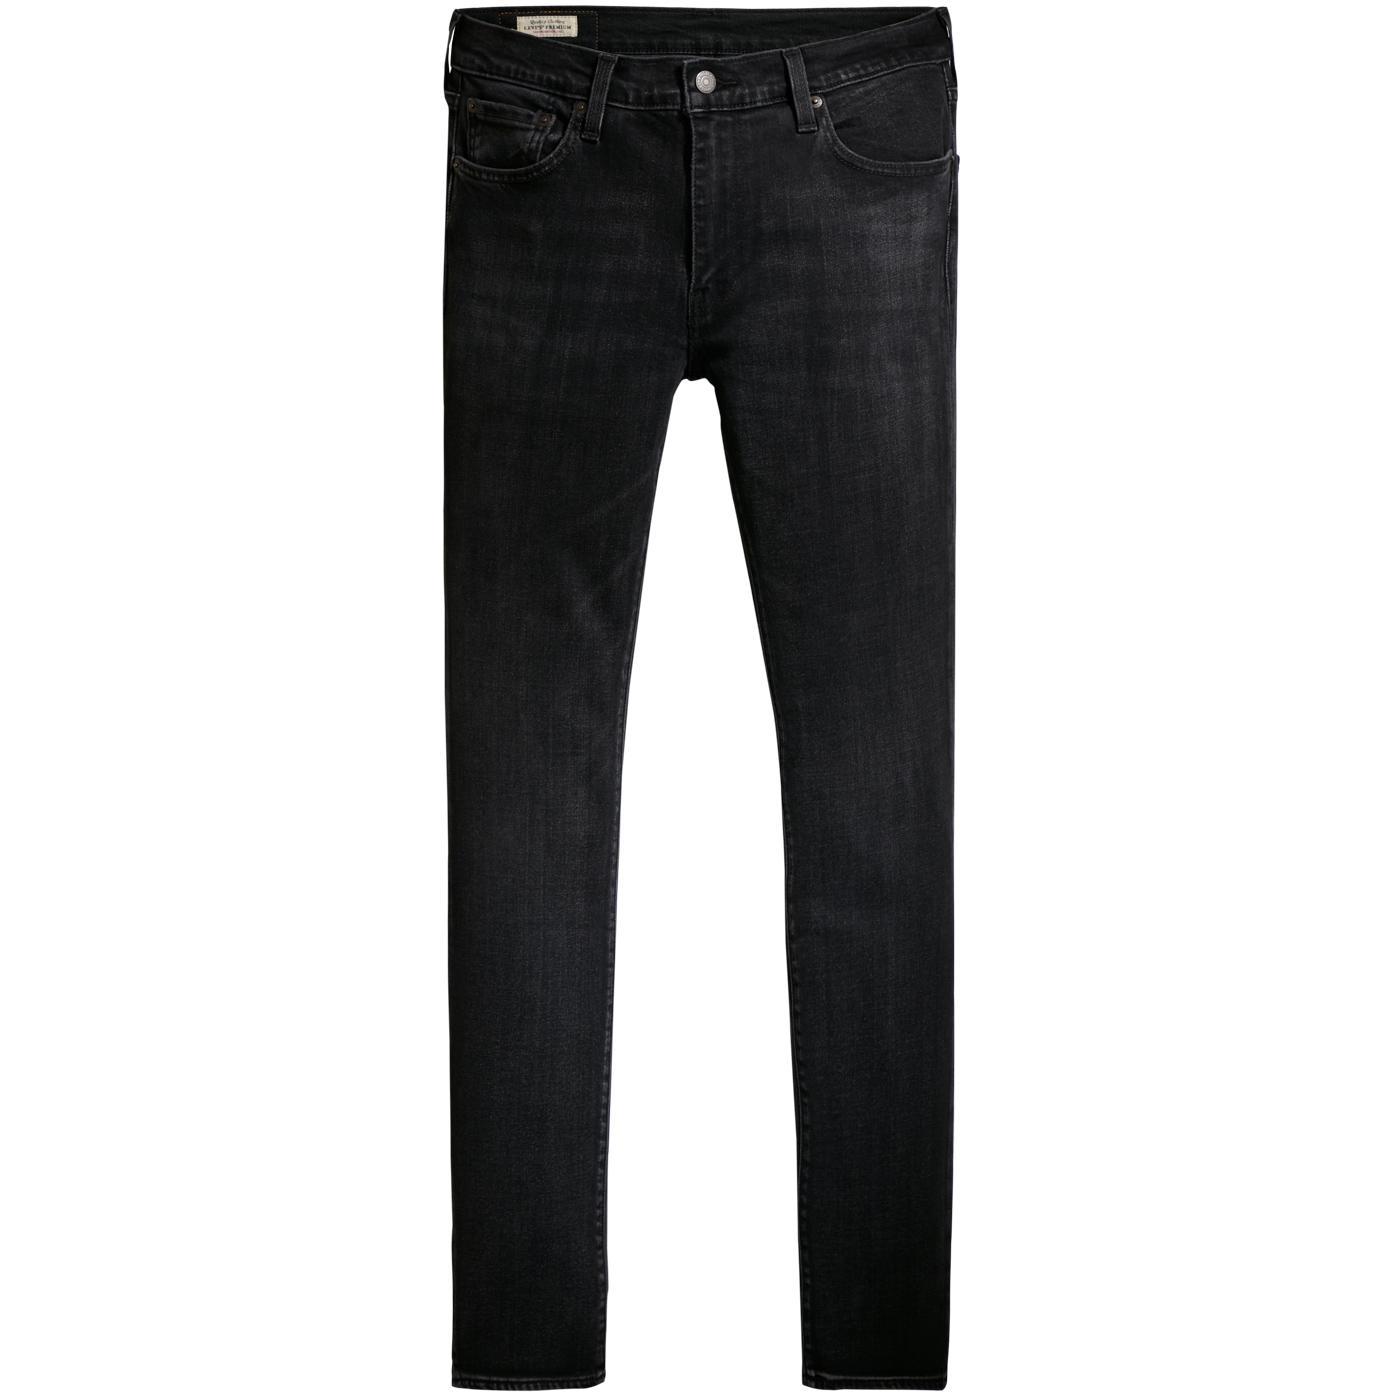 LEVI'S 511 Flex Slim Jeans (Slim Caboose Adv.)